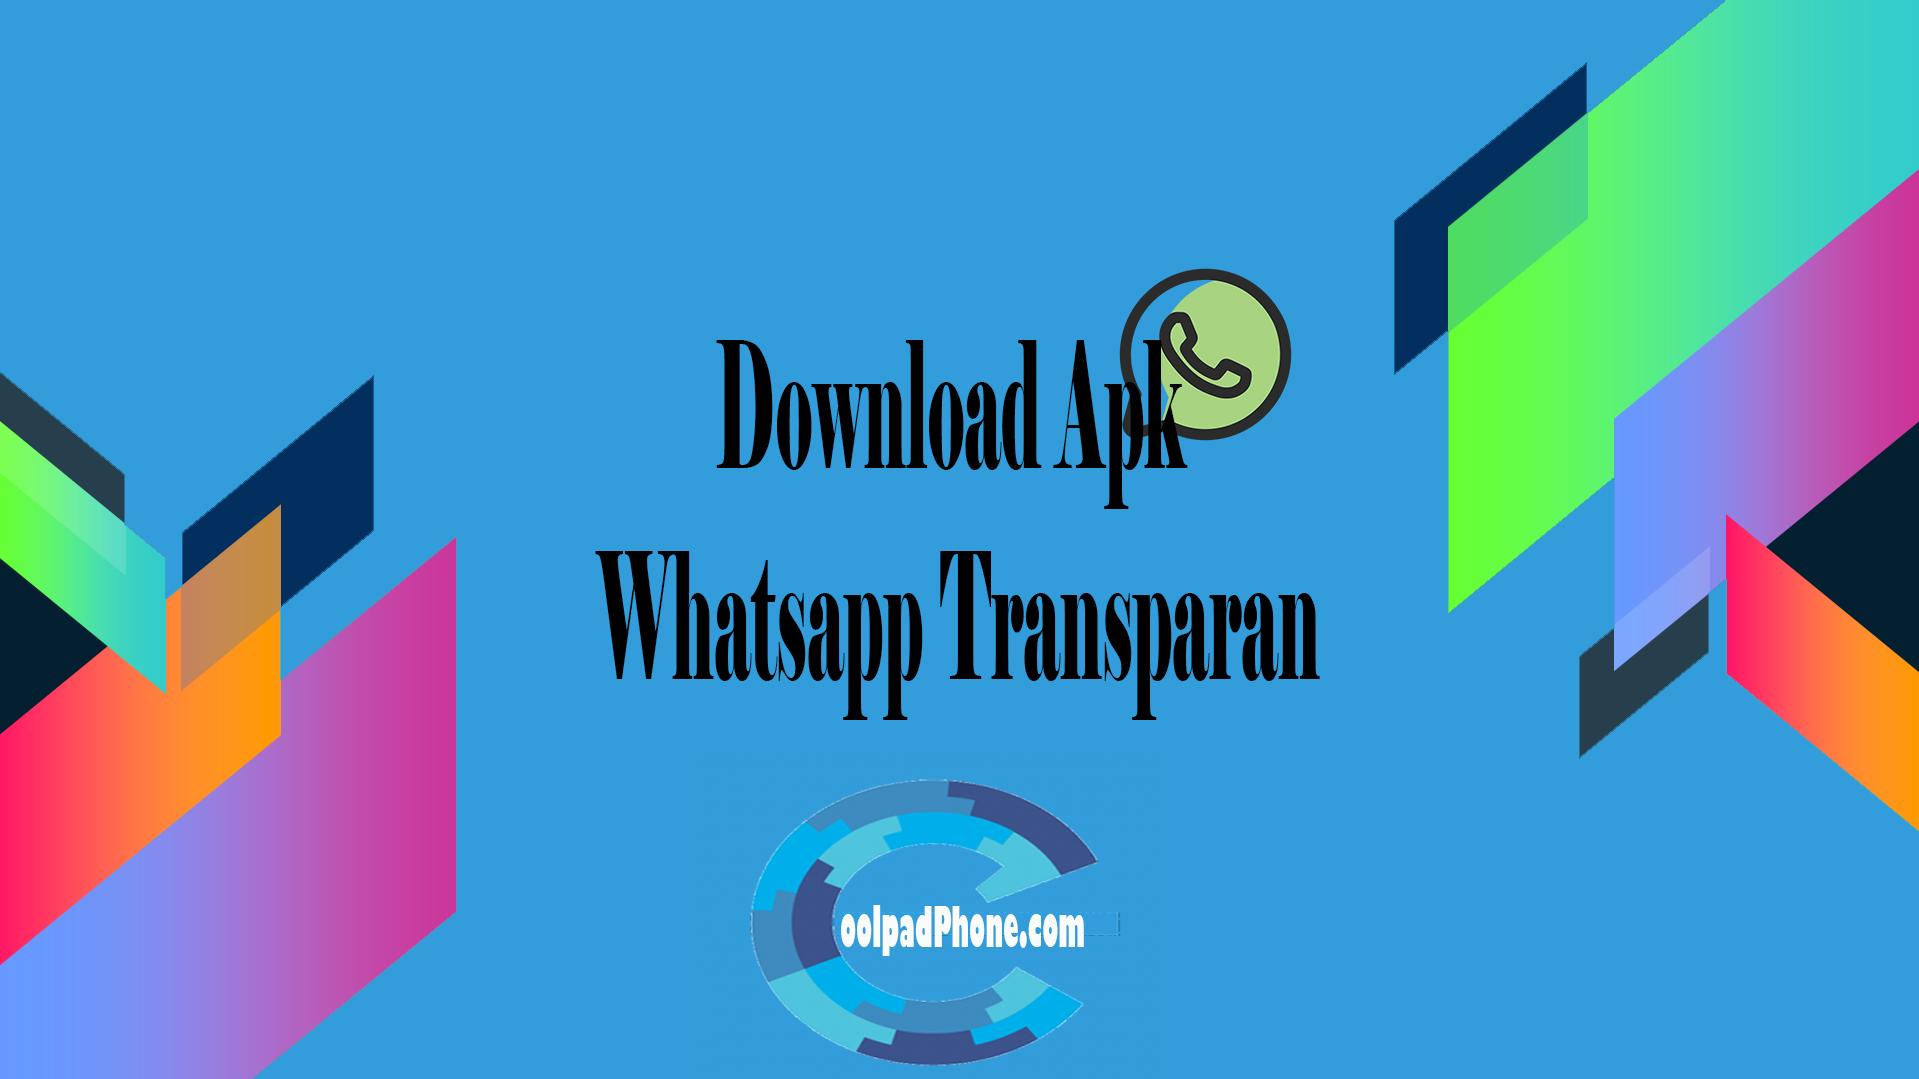 Download Apk Whatsapp Transparan